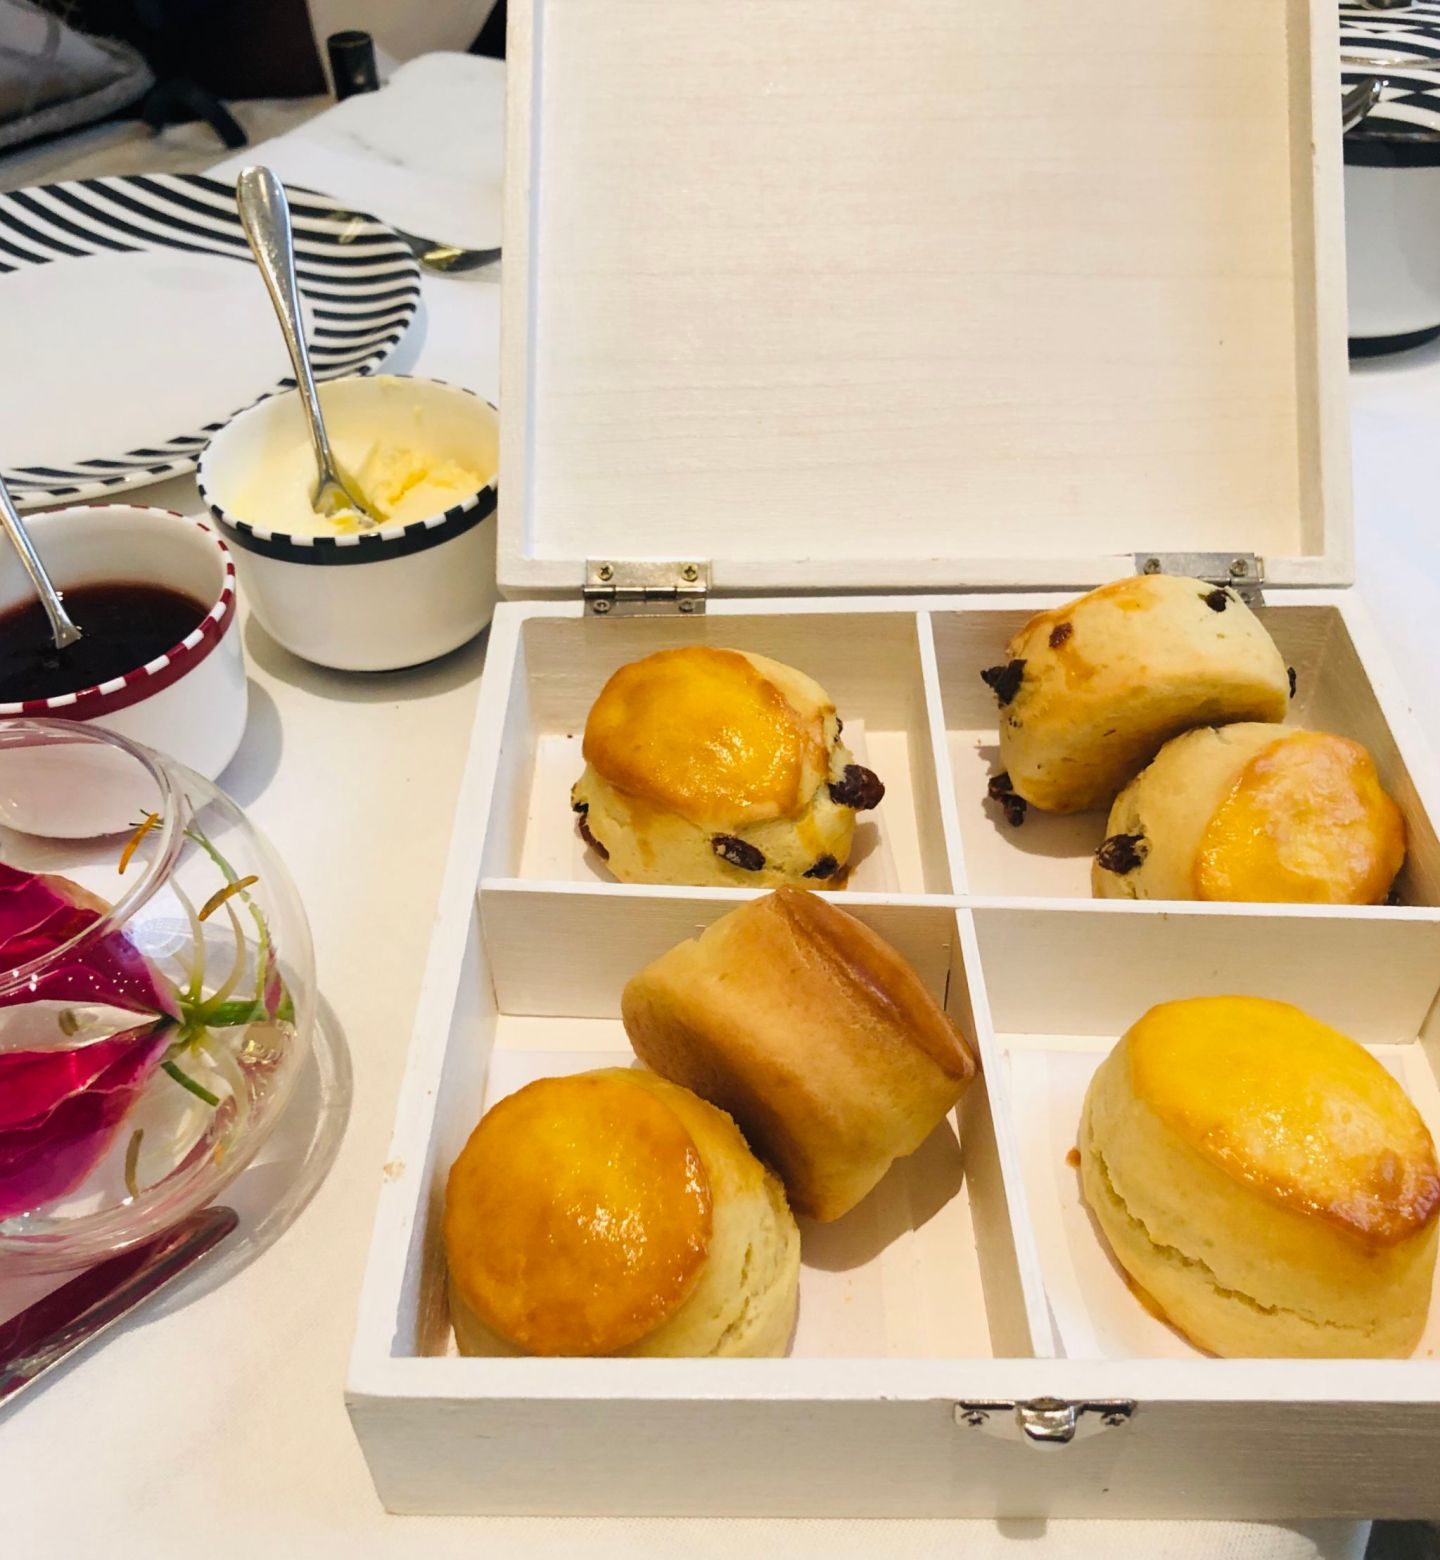 Corinthia Hotel London Afternoon tea Prices